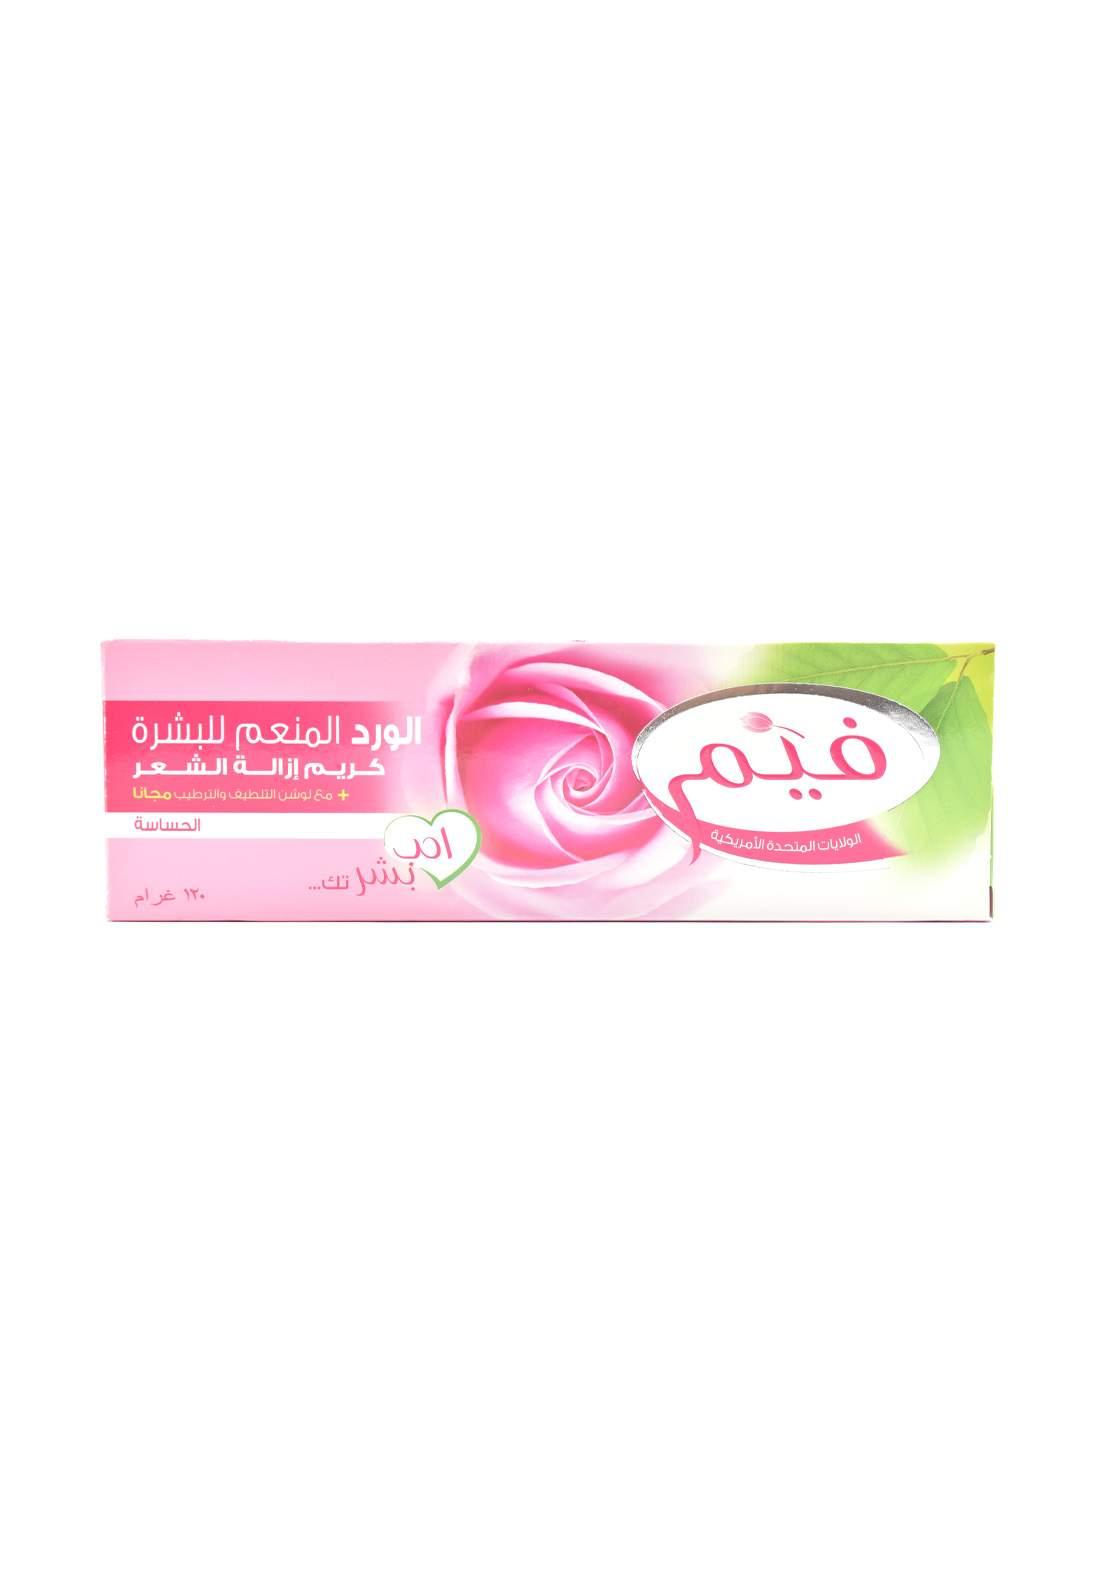 Fem 136 Hair Removal Cream Rose 120gm  كريم ازالة الشعر